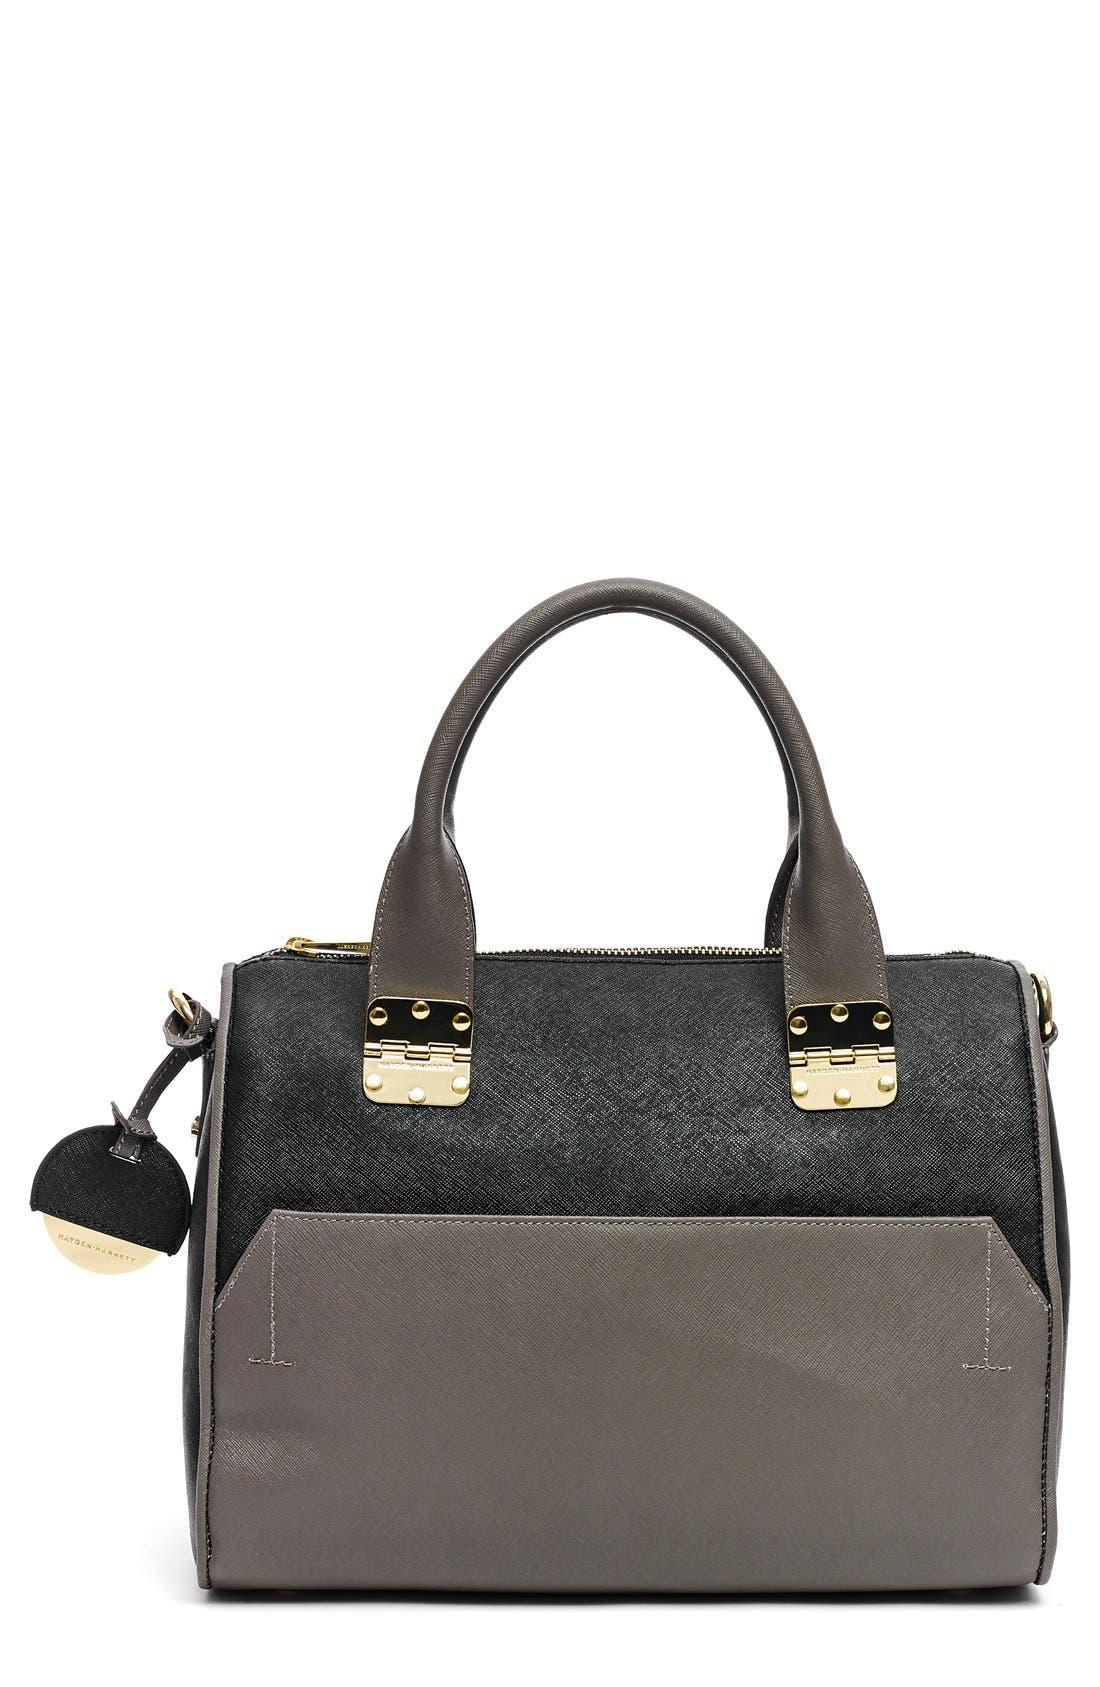 Alternate Image 1 Selected - Hayden-Harnett 'Sandrine' Saffiano Leather Satchel